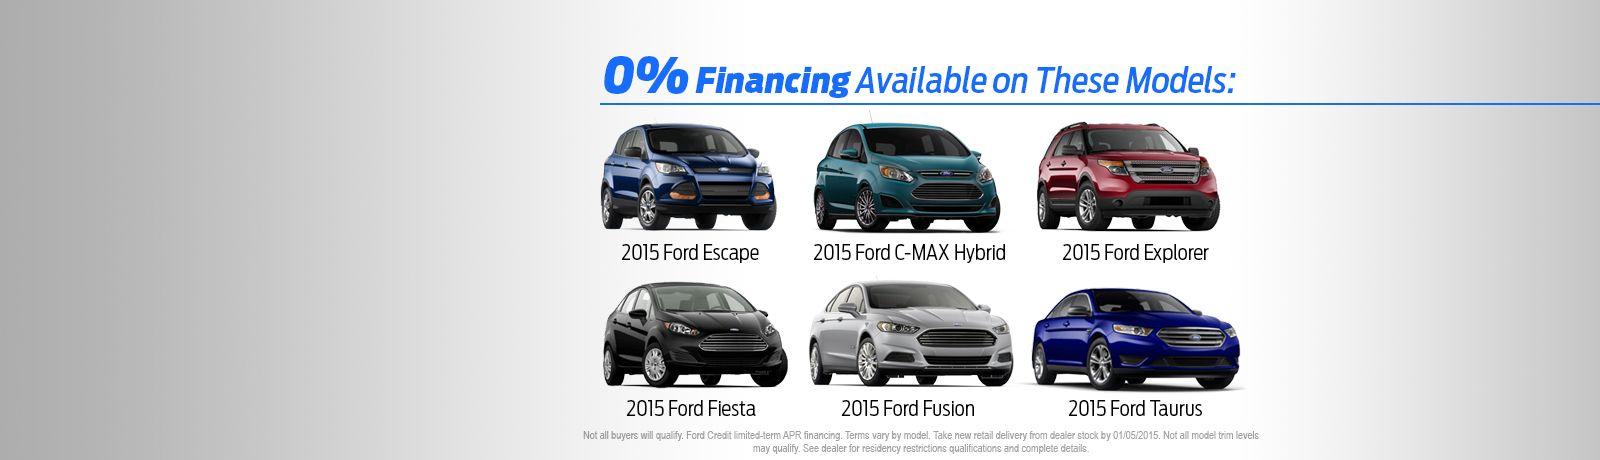 Ford New & Used Car Dealer Novato, Marin County, CA ...